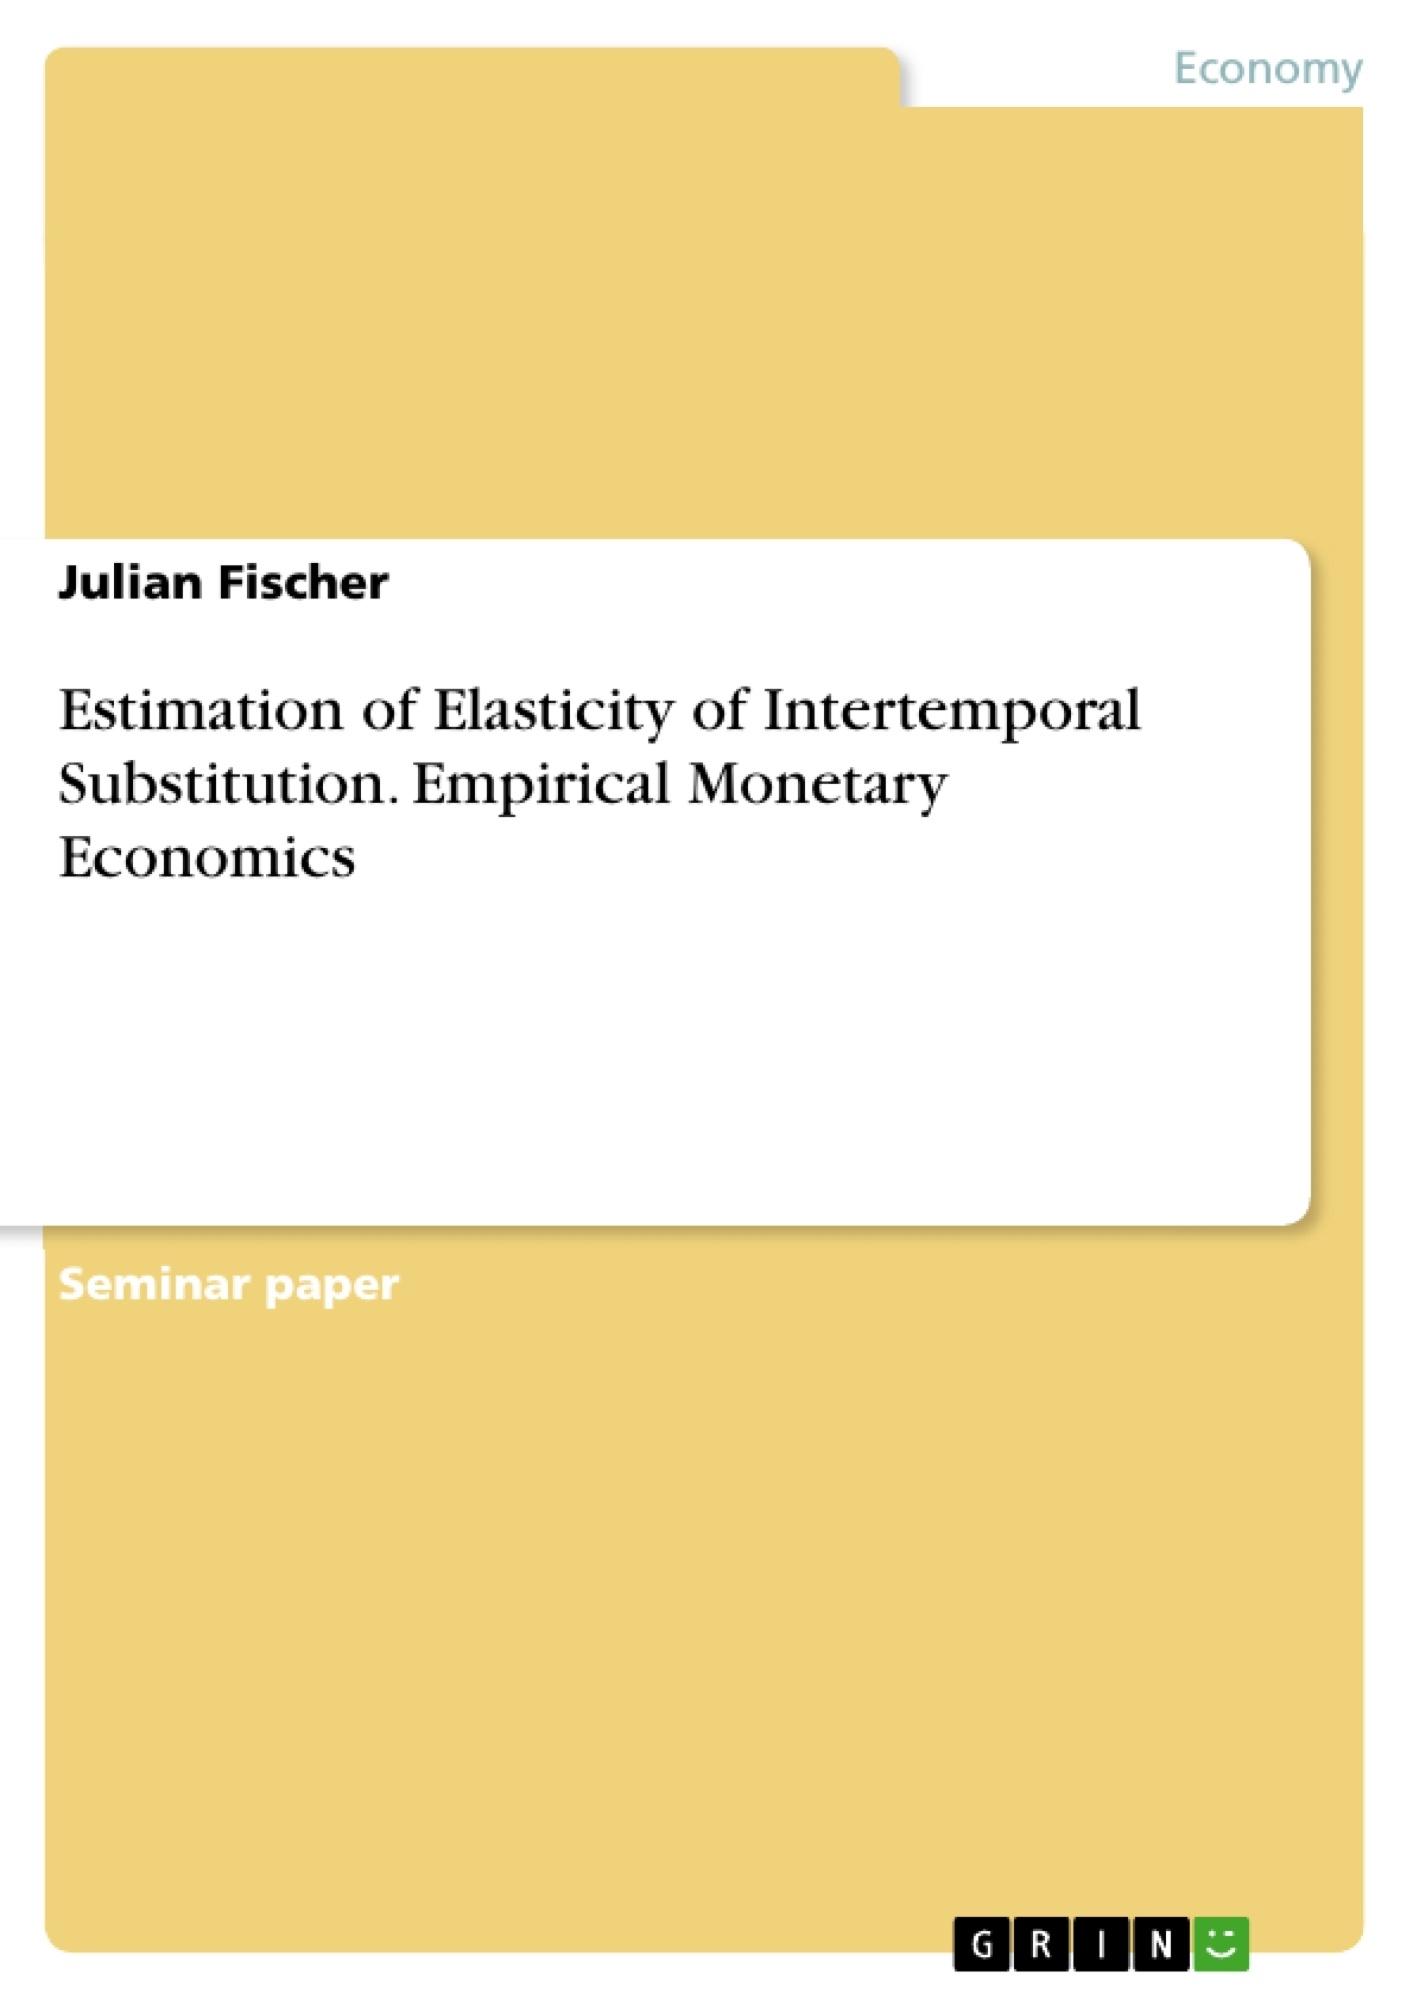 Title: Estimation of Elasticity of Intertemporal Substitution. Empirical Monetary Economics